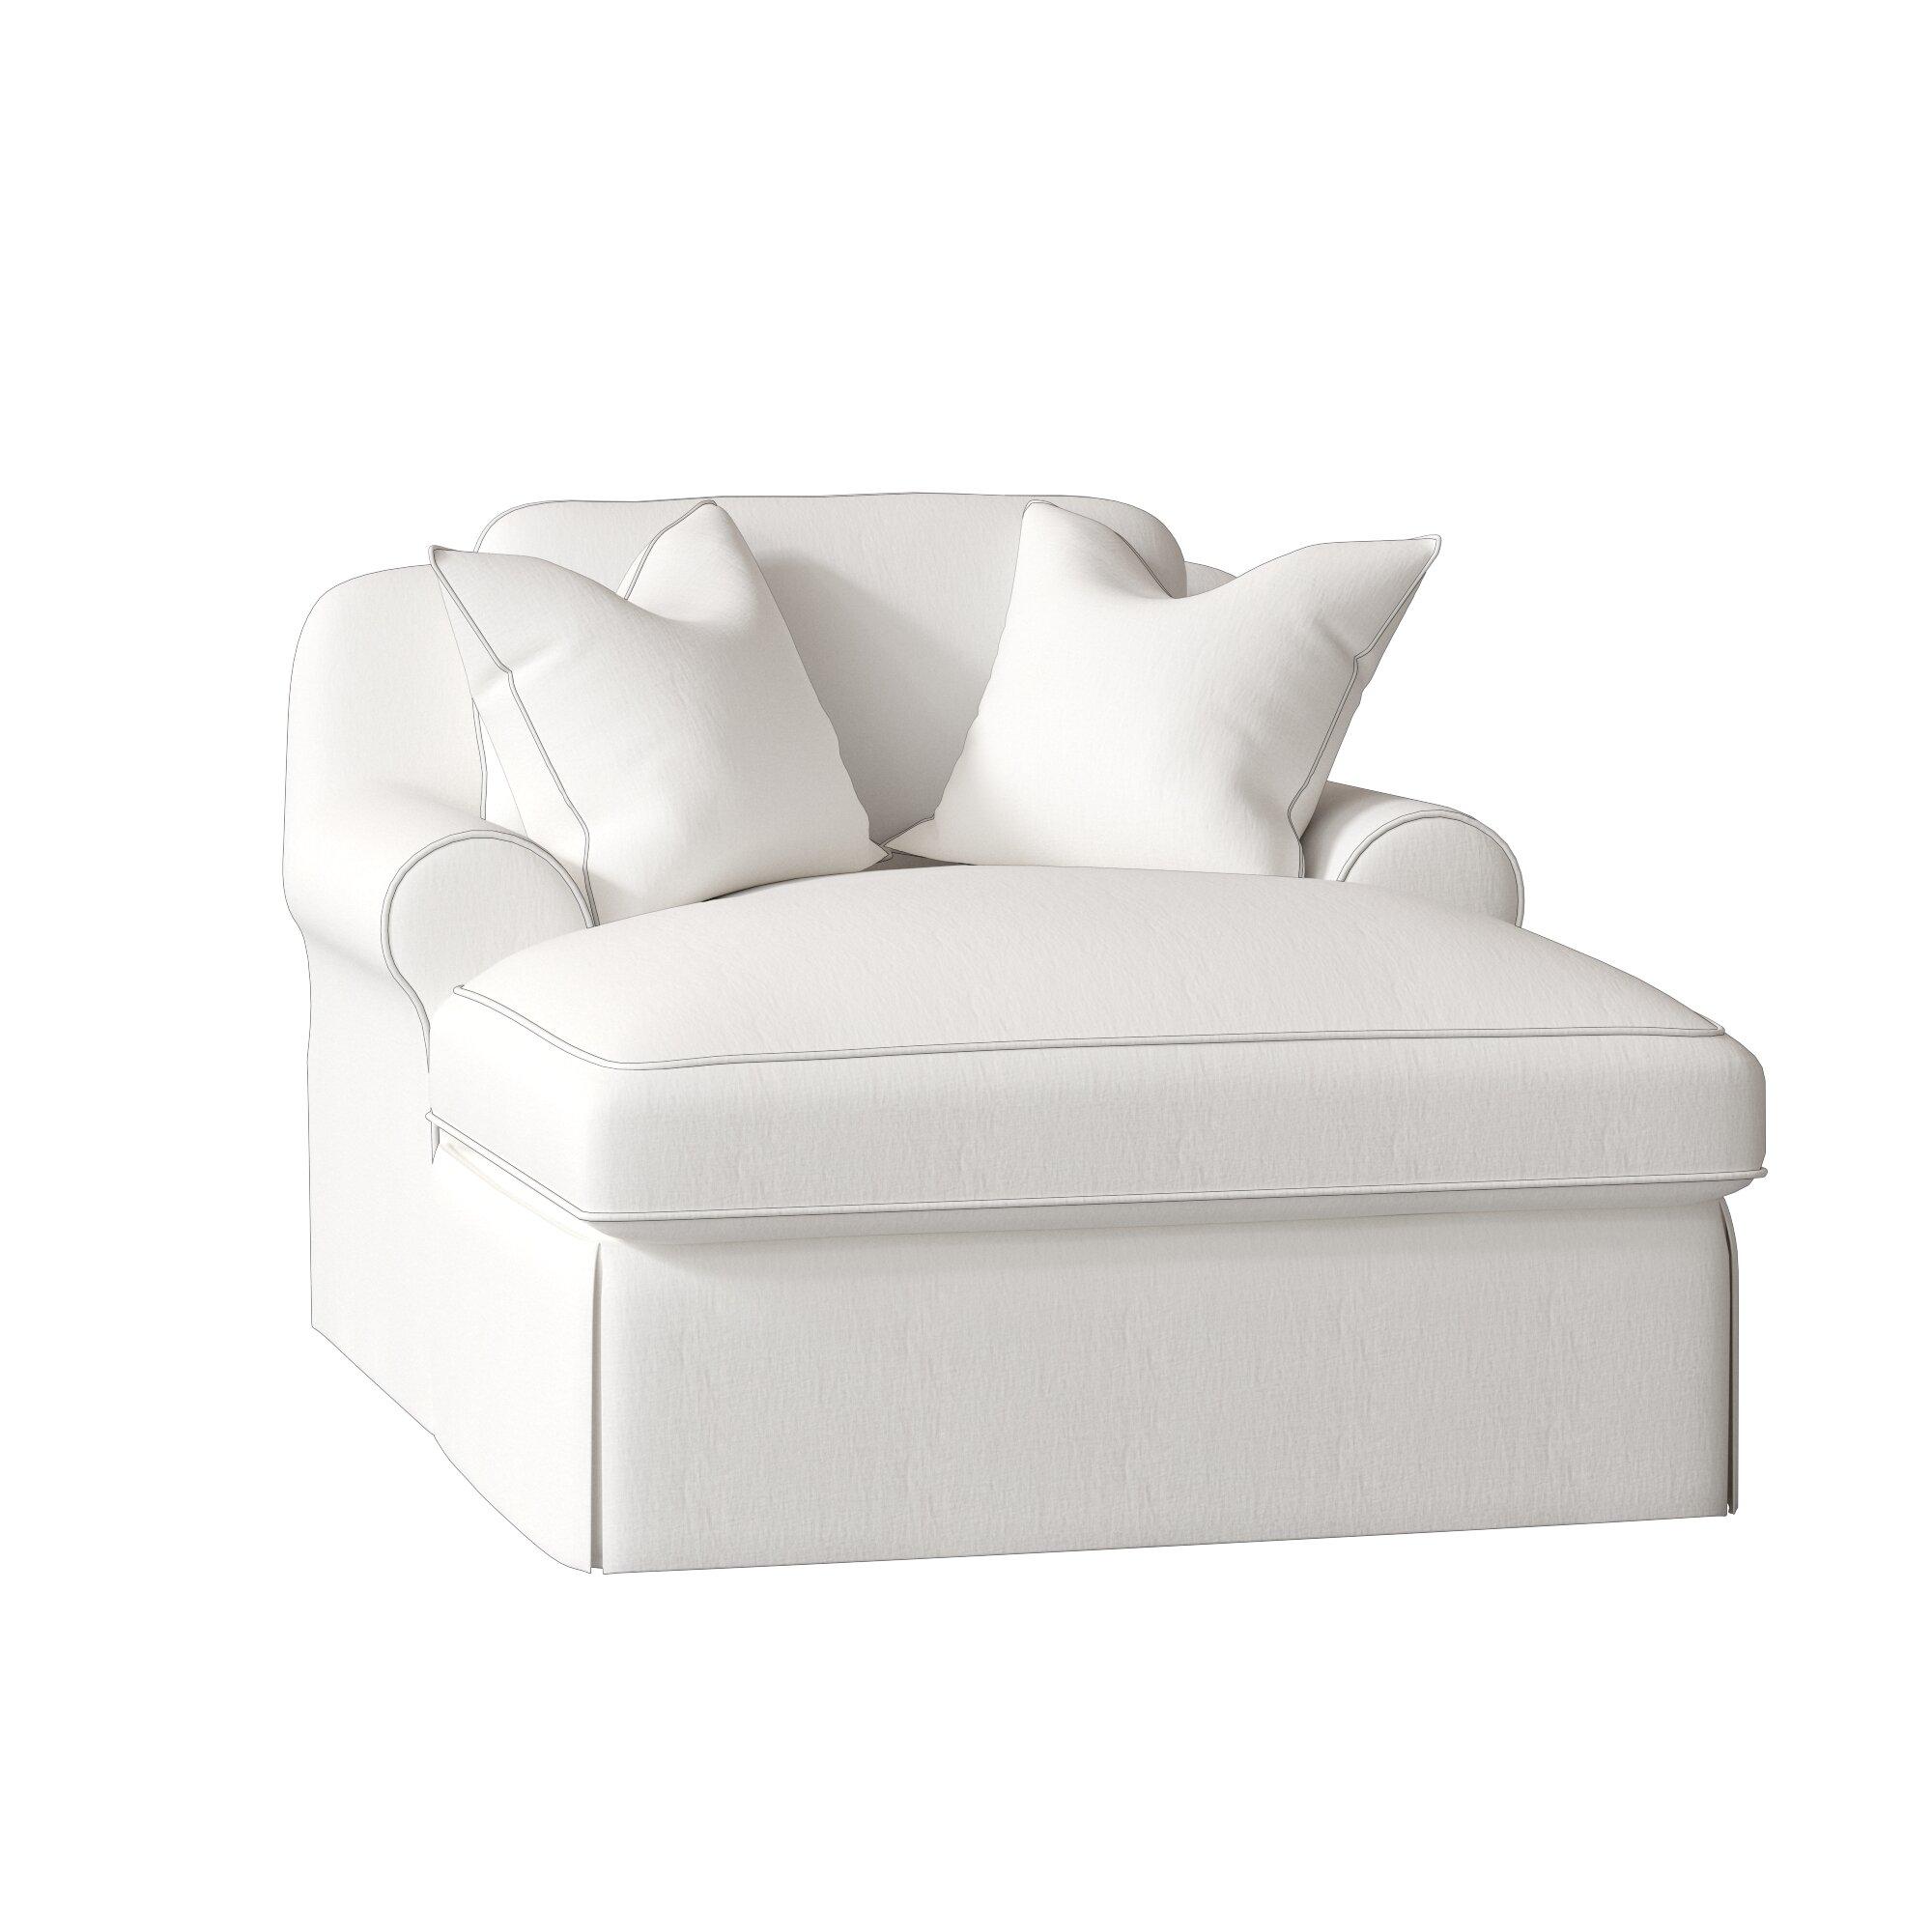 White Chaise Lounge Chairs Youu0027ll Love In 2019 | Wayfair